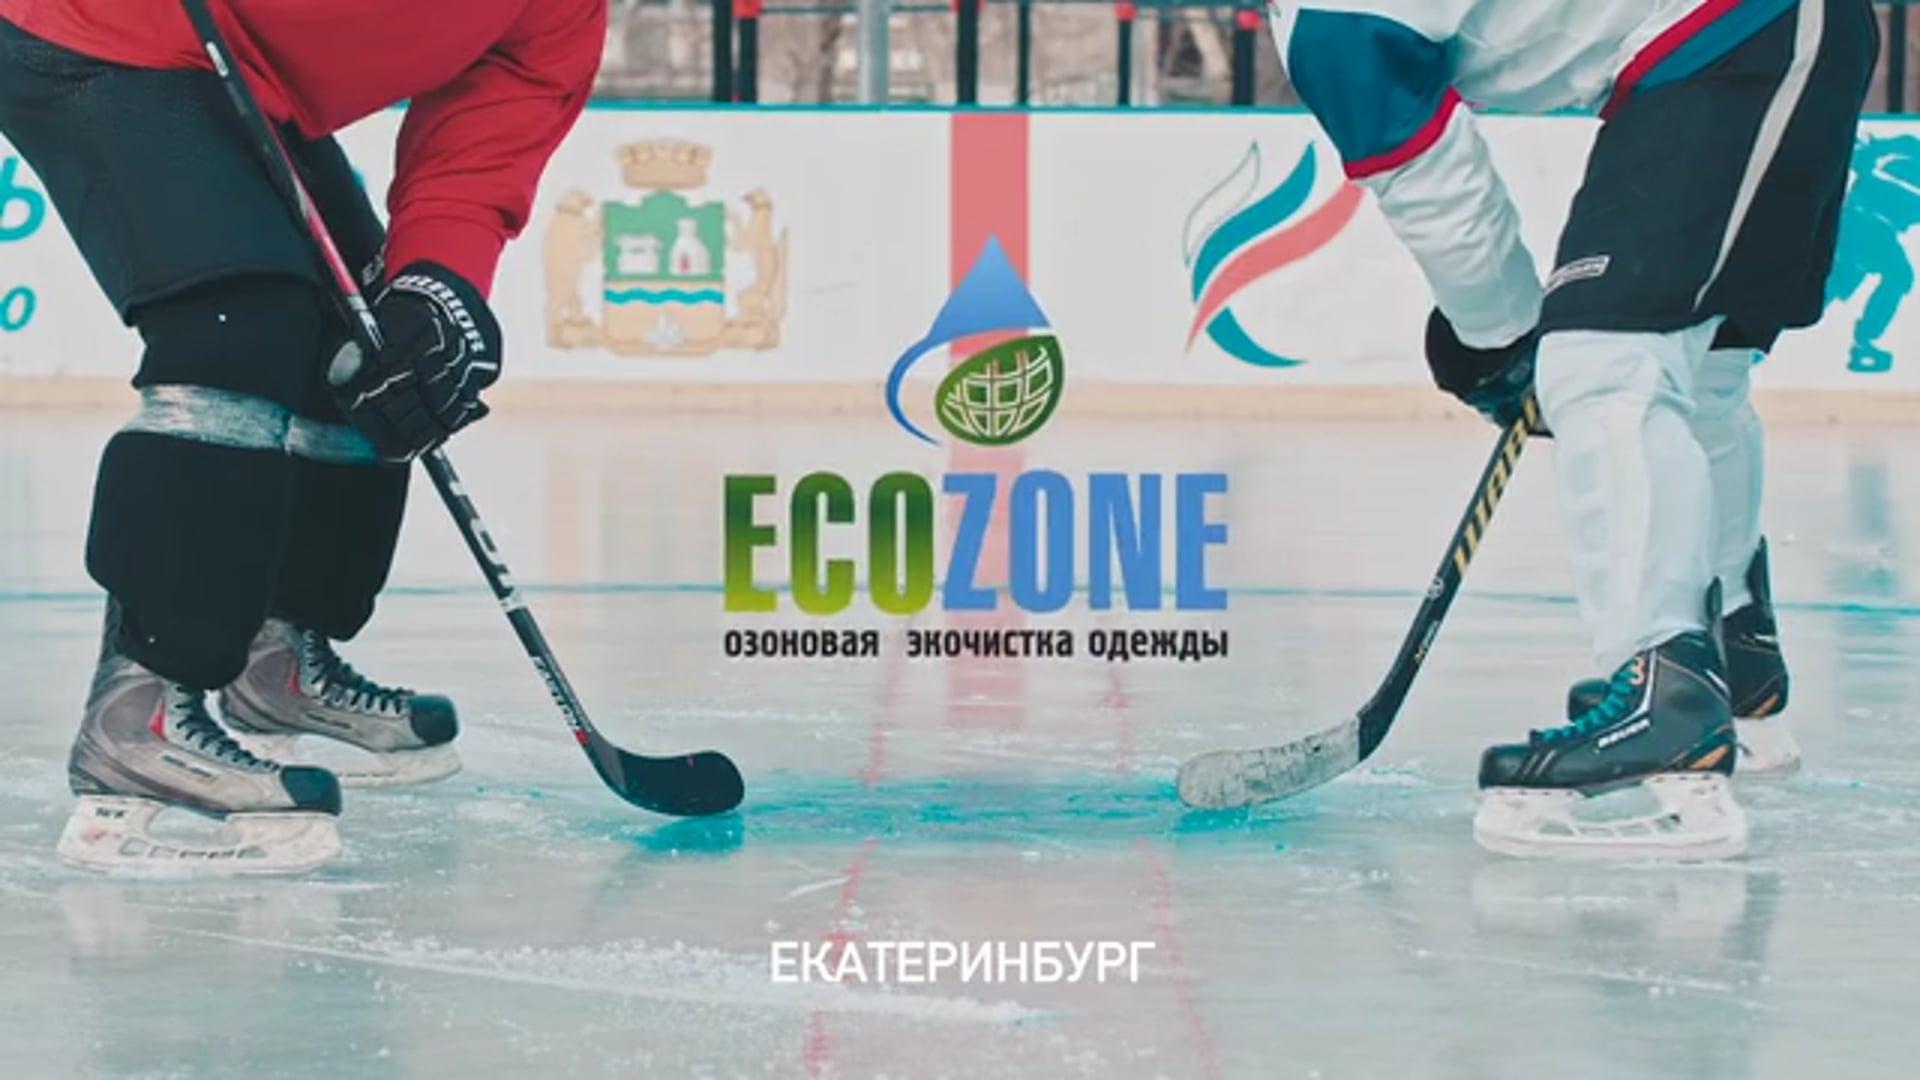 Экозон (рекламное видео)